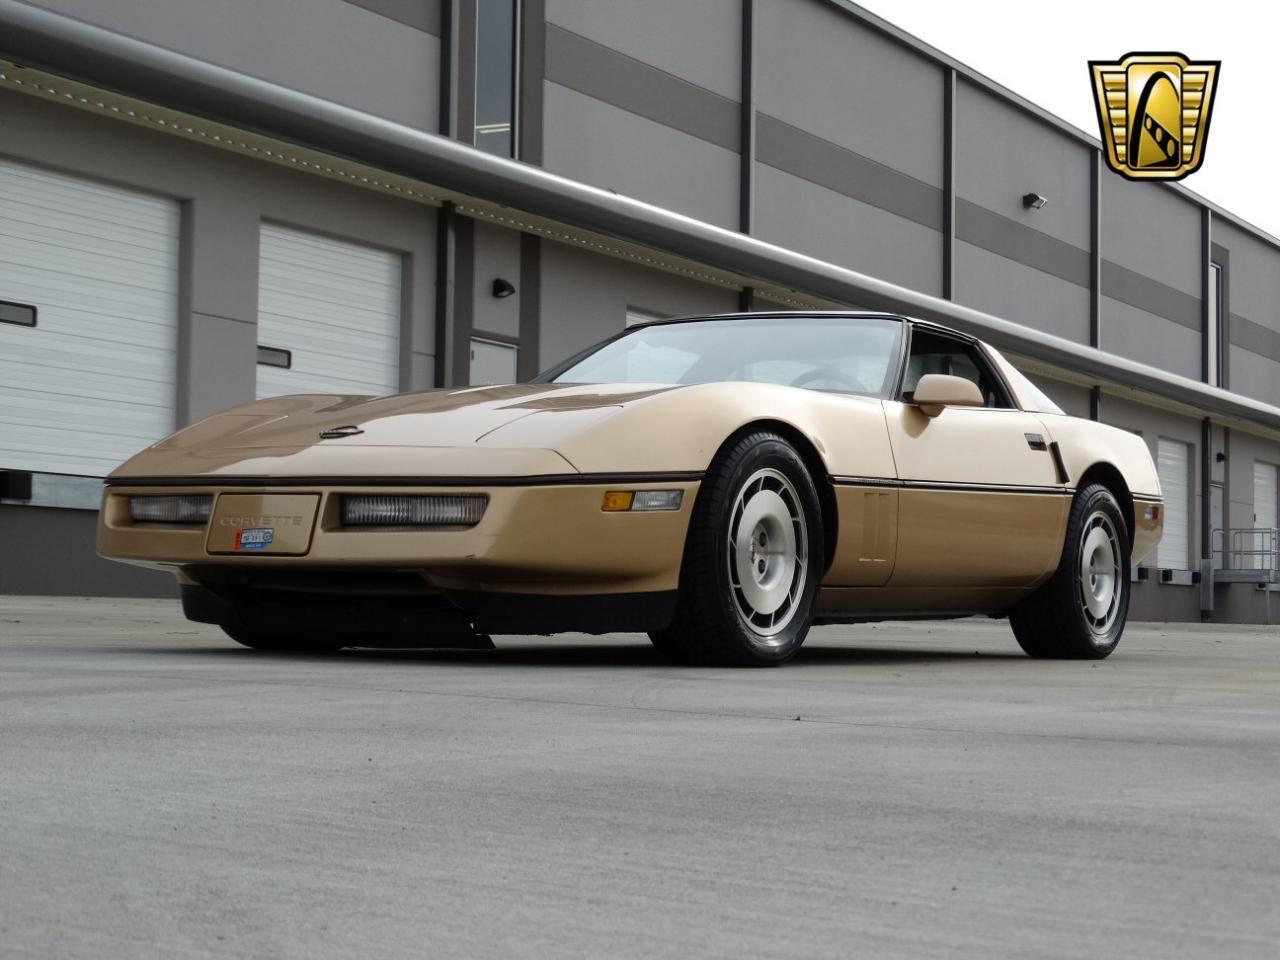 Large Picture of '86 Chevrolet Corvette located in Georgia - KF5W